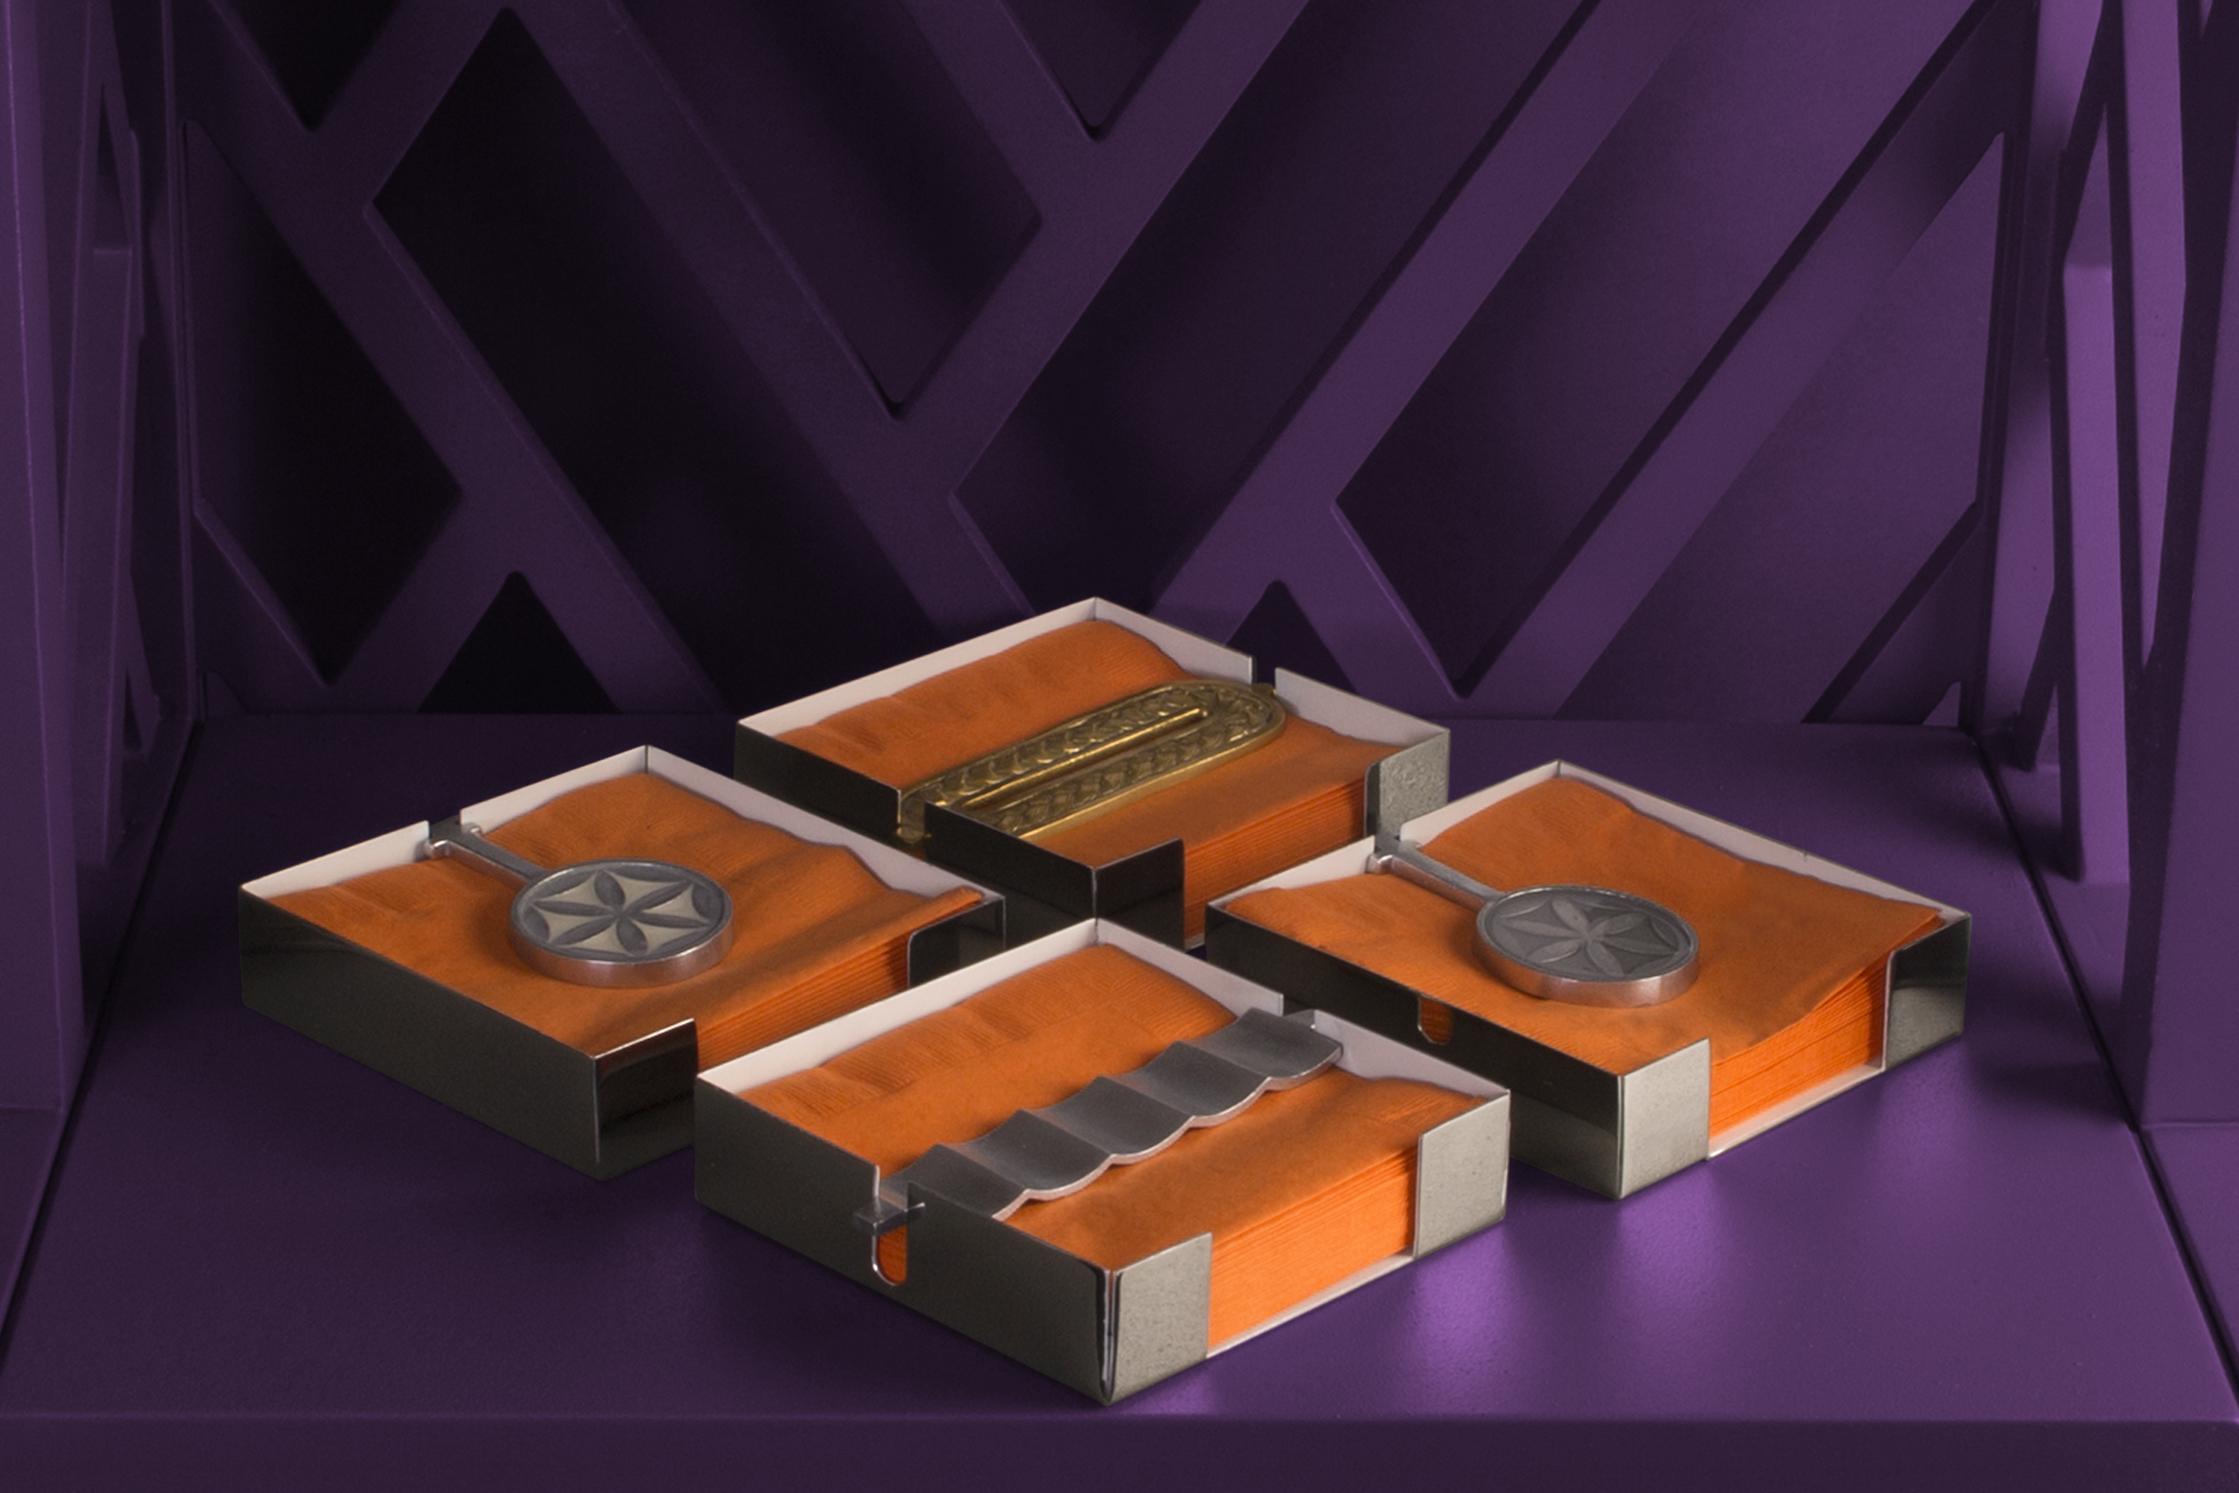 Marigold_Categories_Mixed_Napkin Boxes 01.jpg